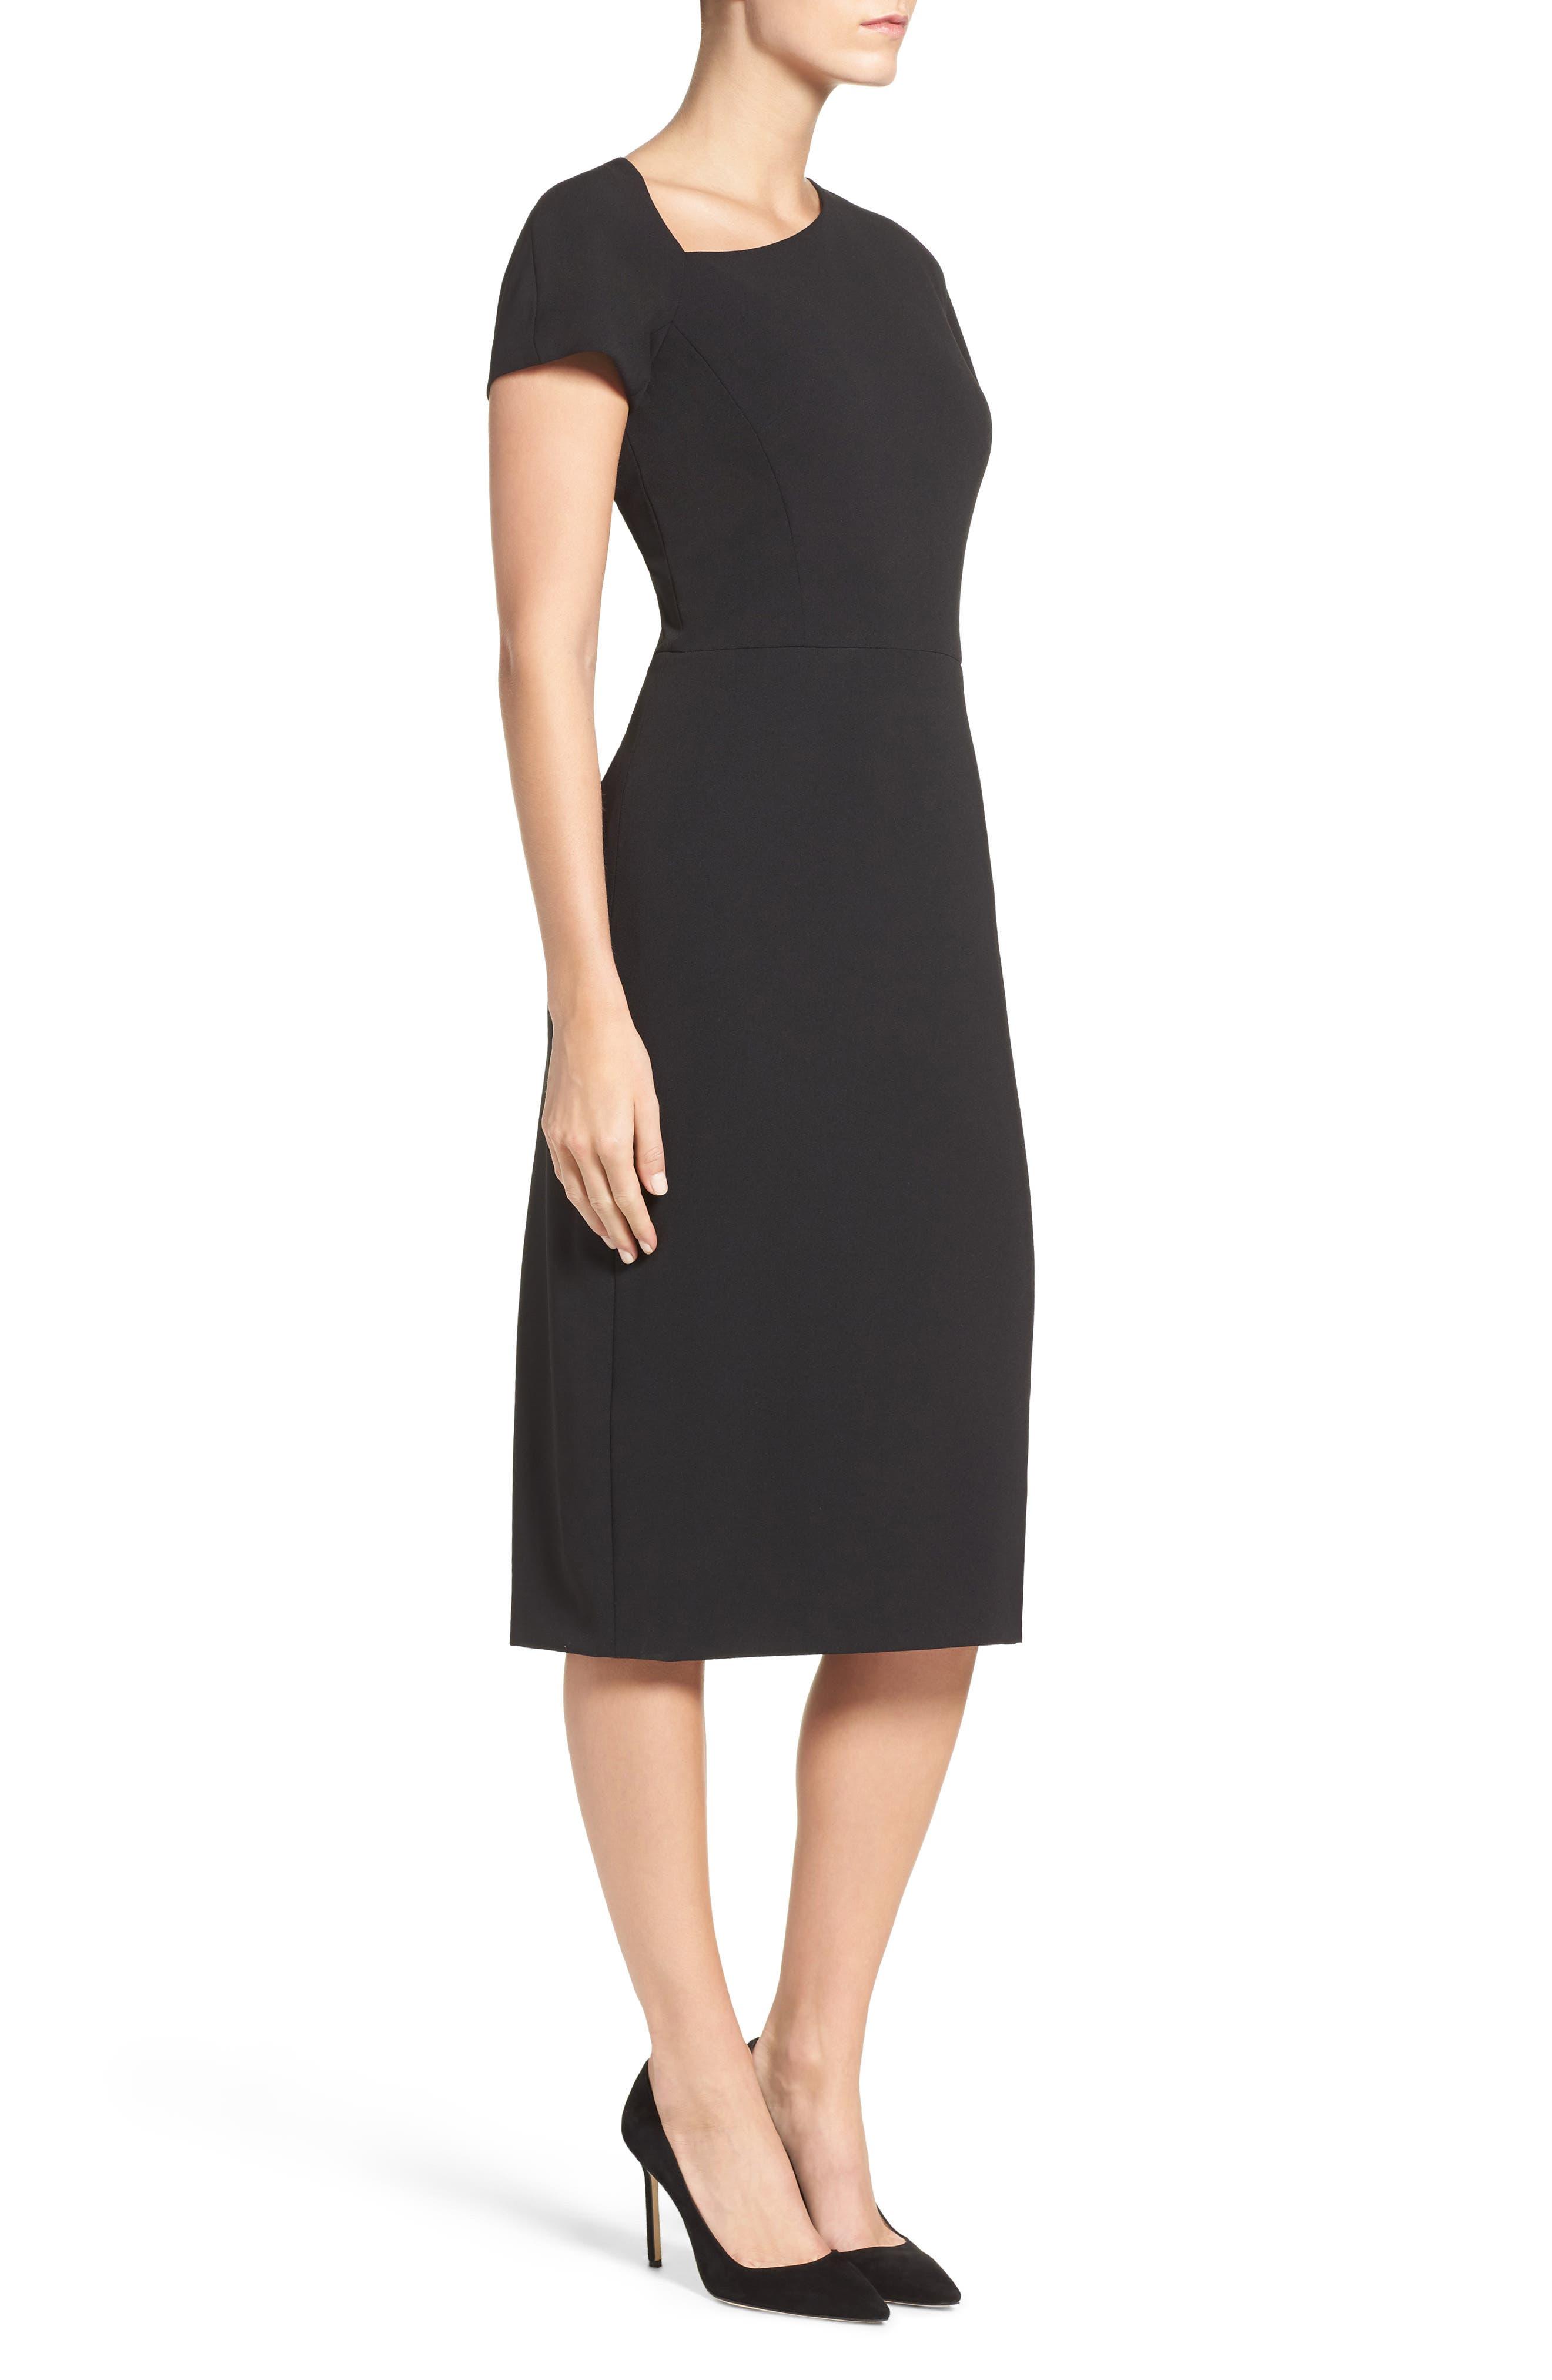 MAGGY LONDON, Asymmetrical Sheath Dress, Alternate thumbnail 4, color, 001